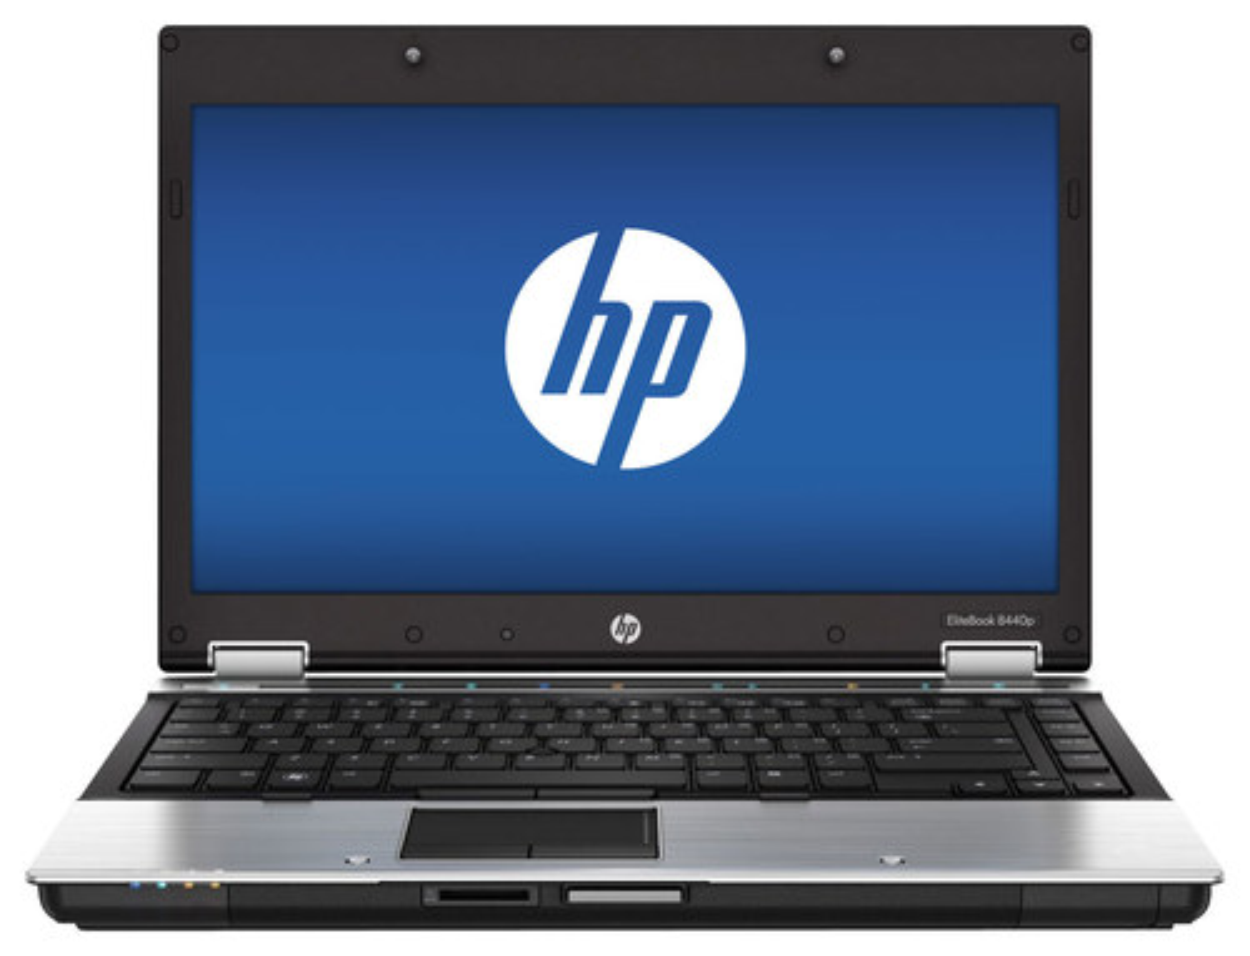 HP - EliteBook 14.1 Refurbished Laptop - Intel Core i5 - 4GB Memory - 500GB Hard Drive - Gray/Silver